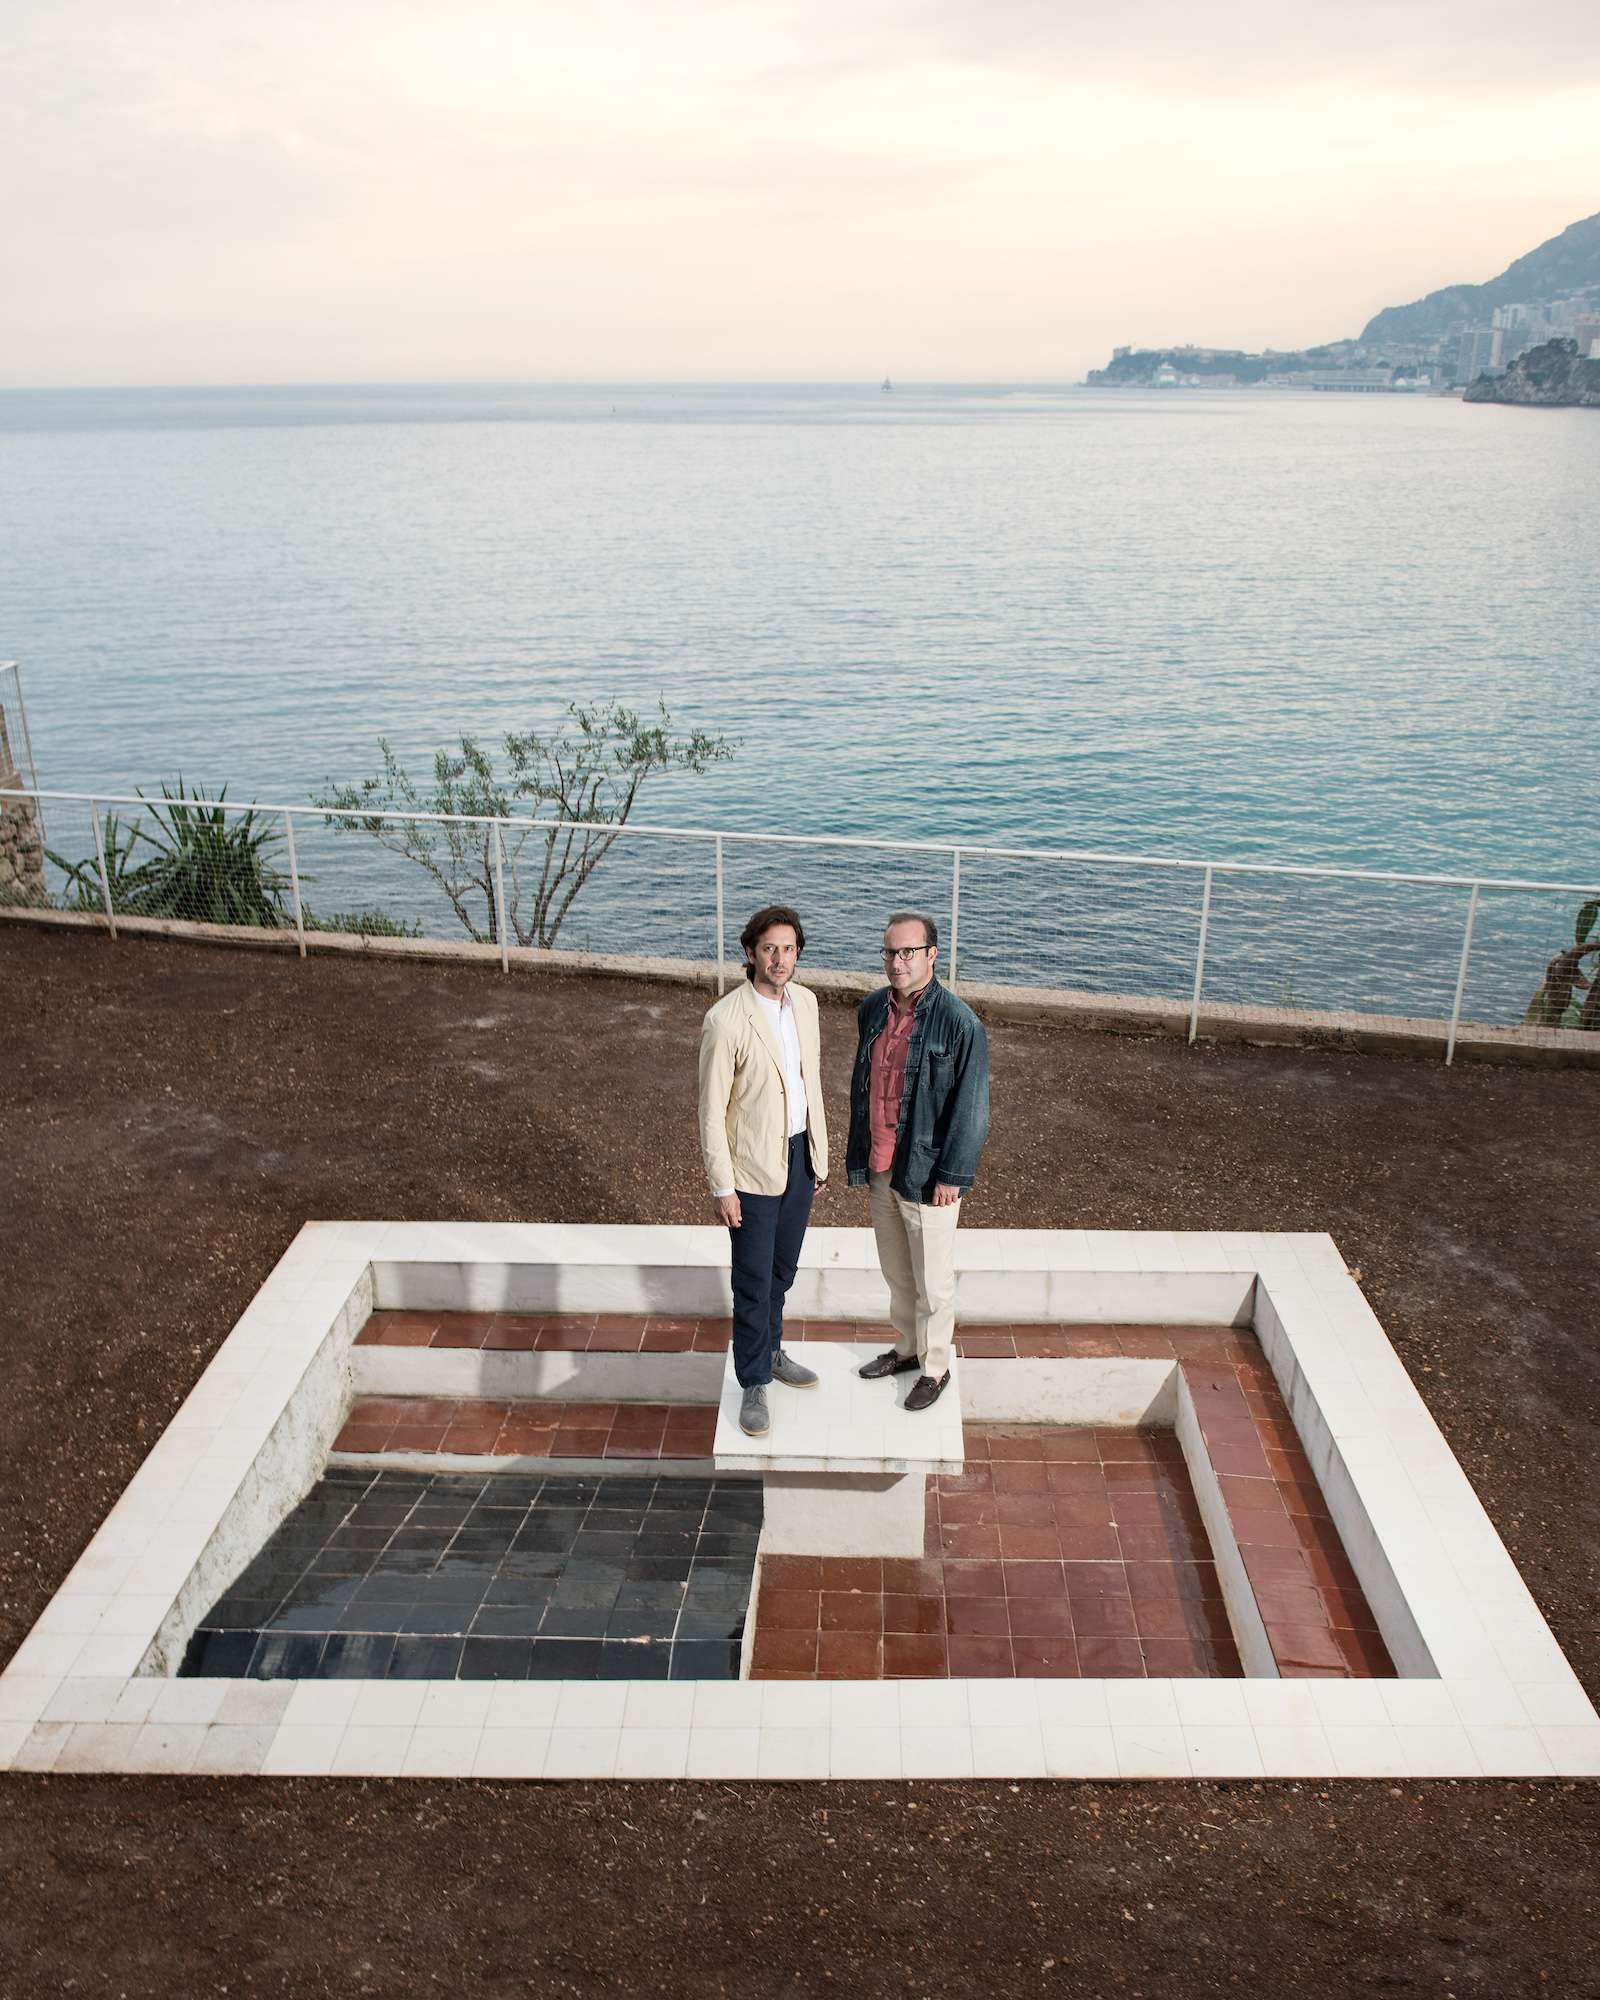 NOMAD_Founders Giorgio Pace and Nicolas Bellavance-Lecompte. Eileen Gray's Villa, 2018. Photographer Giulia Piermatiri.jpg